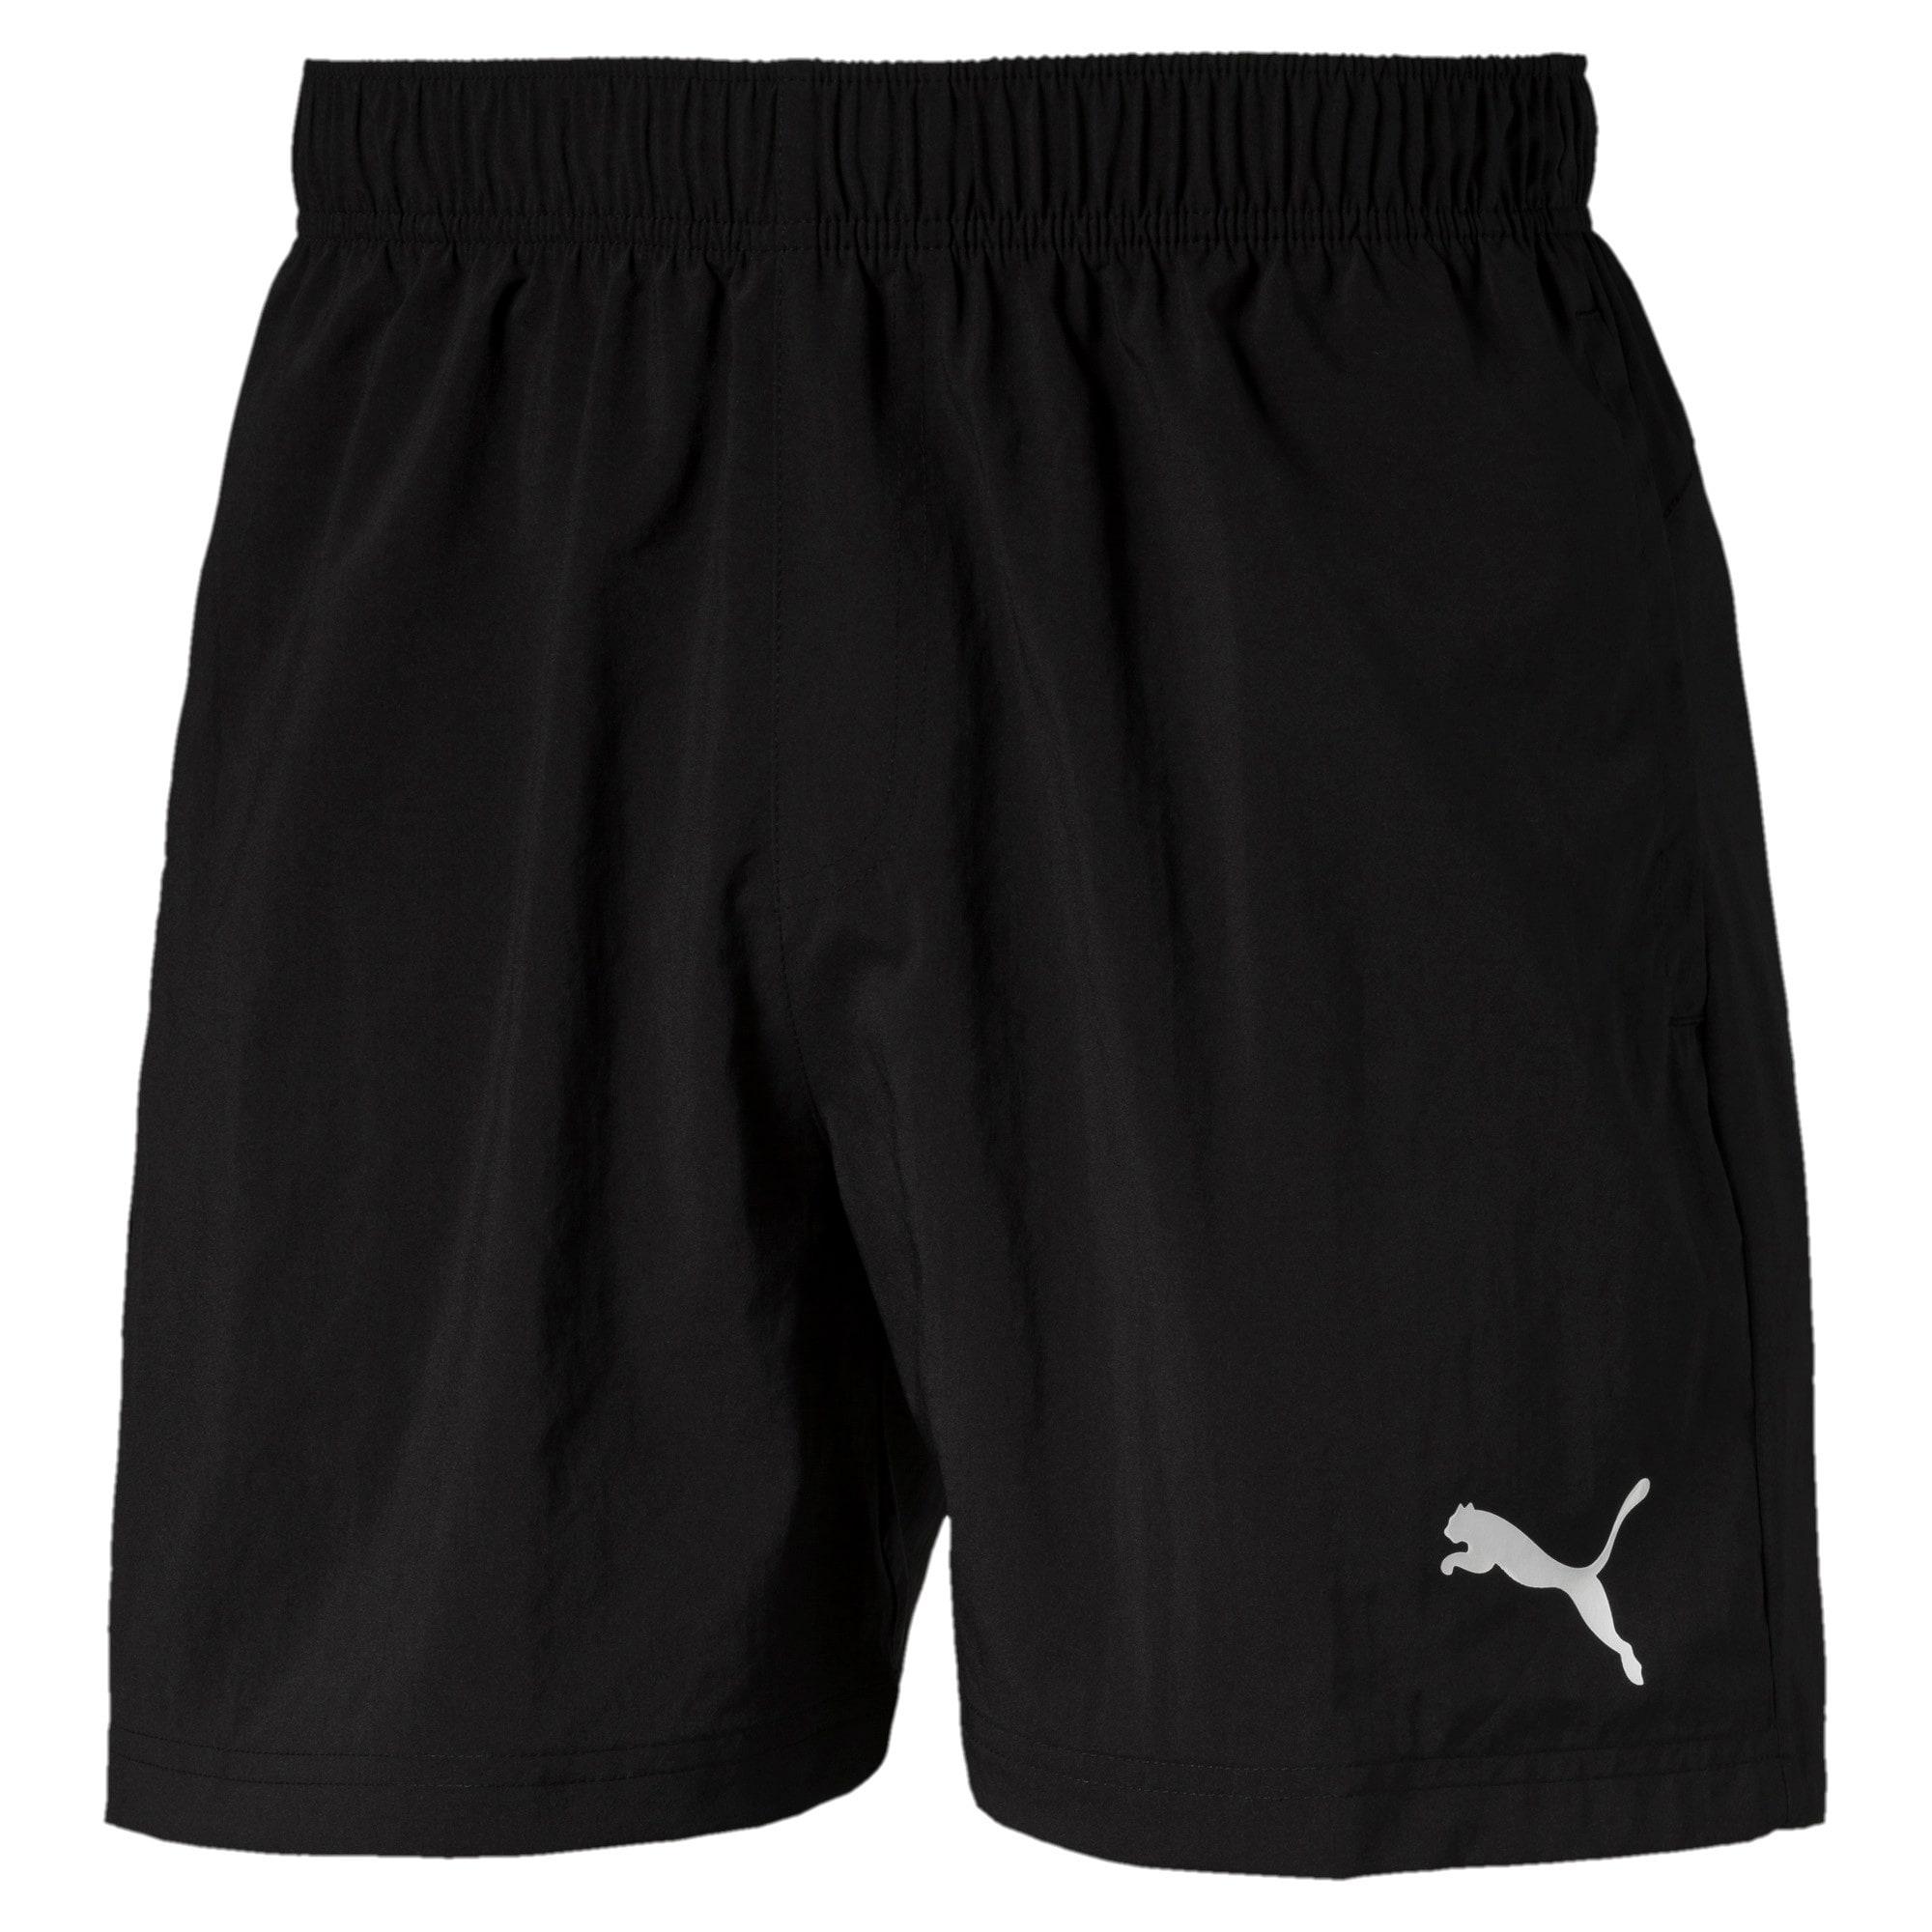 Thumbnail 1 of Active Men's Woven Shorts, Puma Black, medium